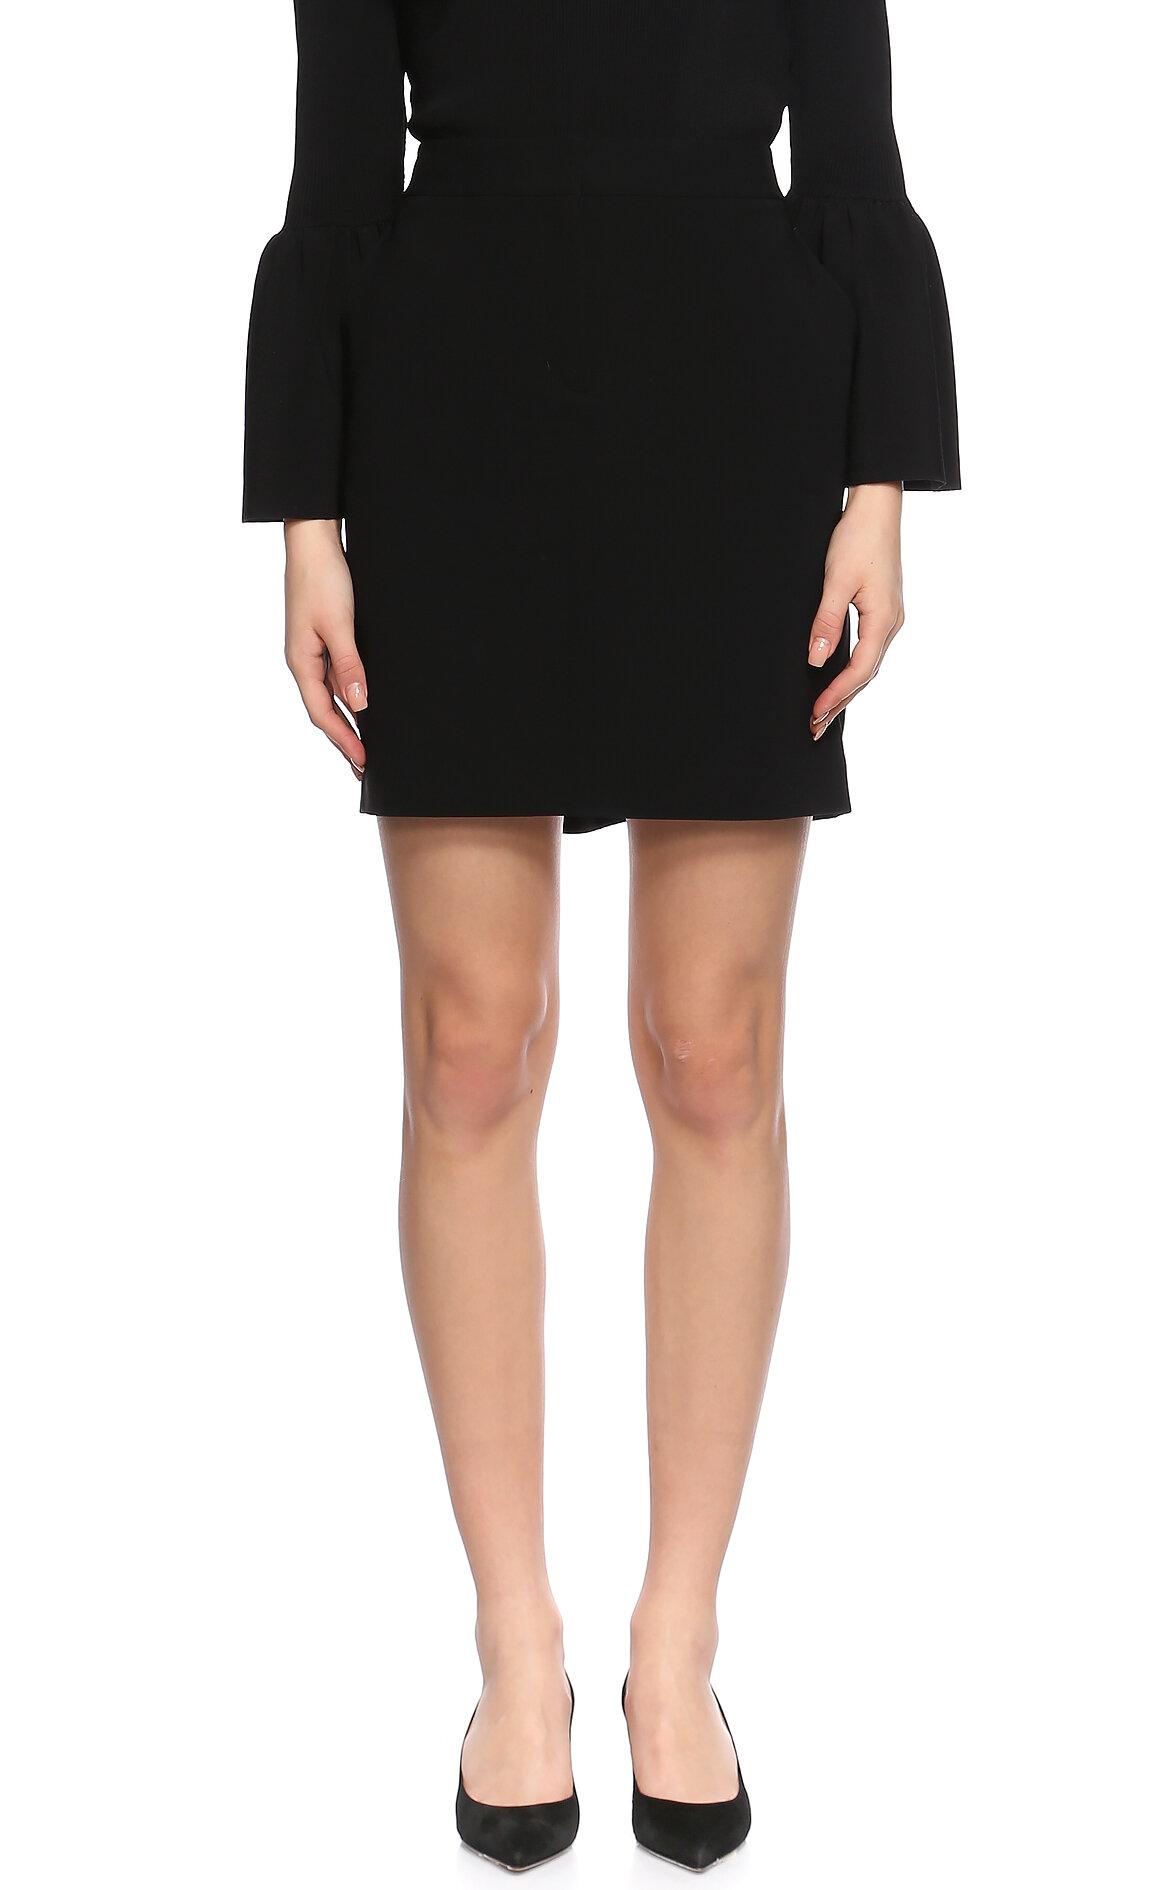 DKNY-DKNY Cepli Mini Siyah Etek